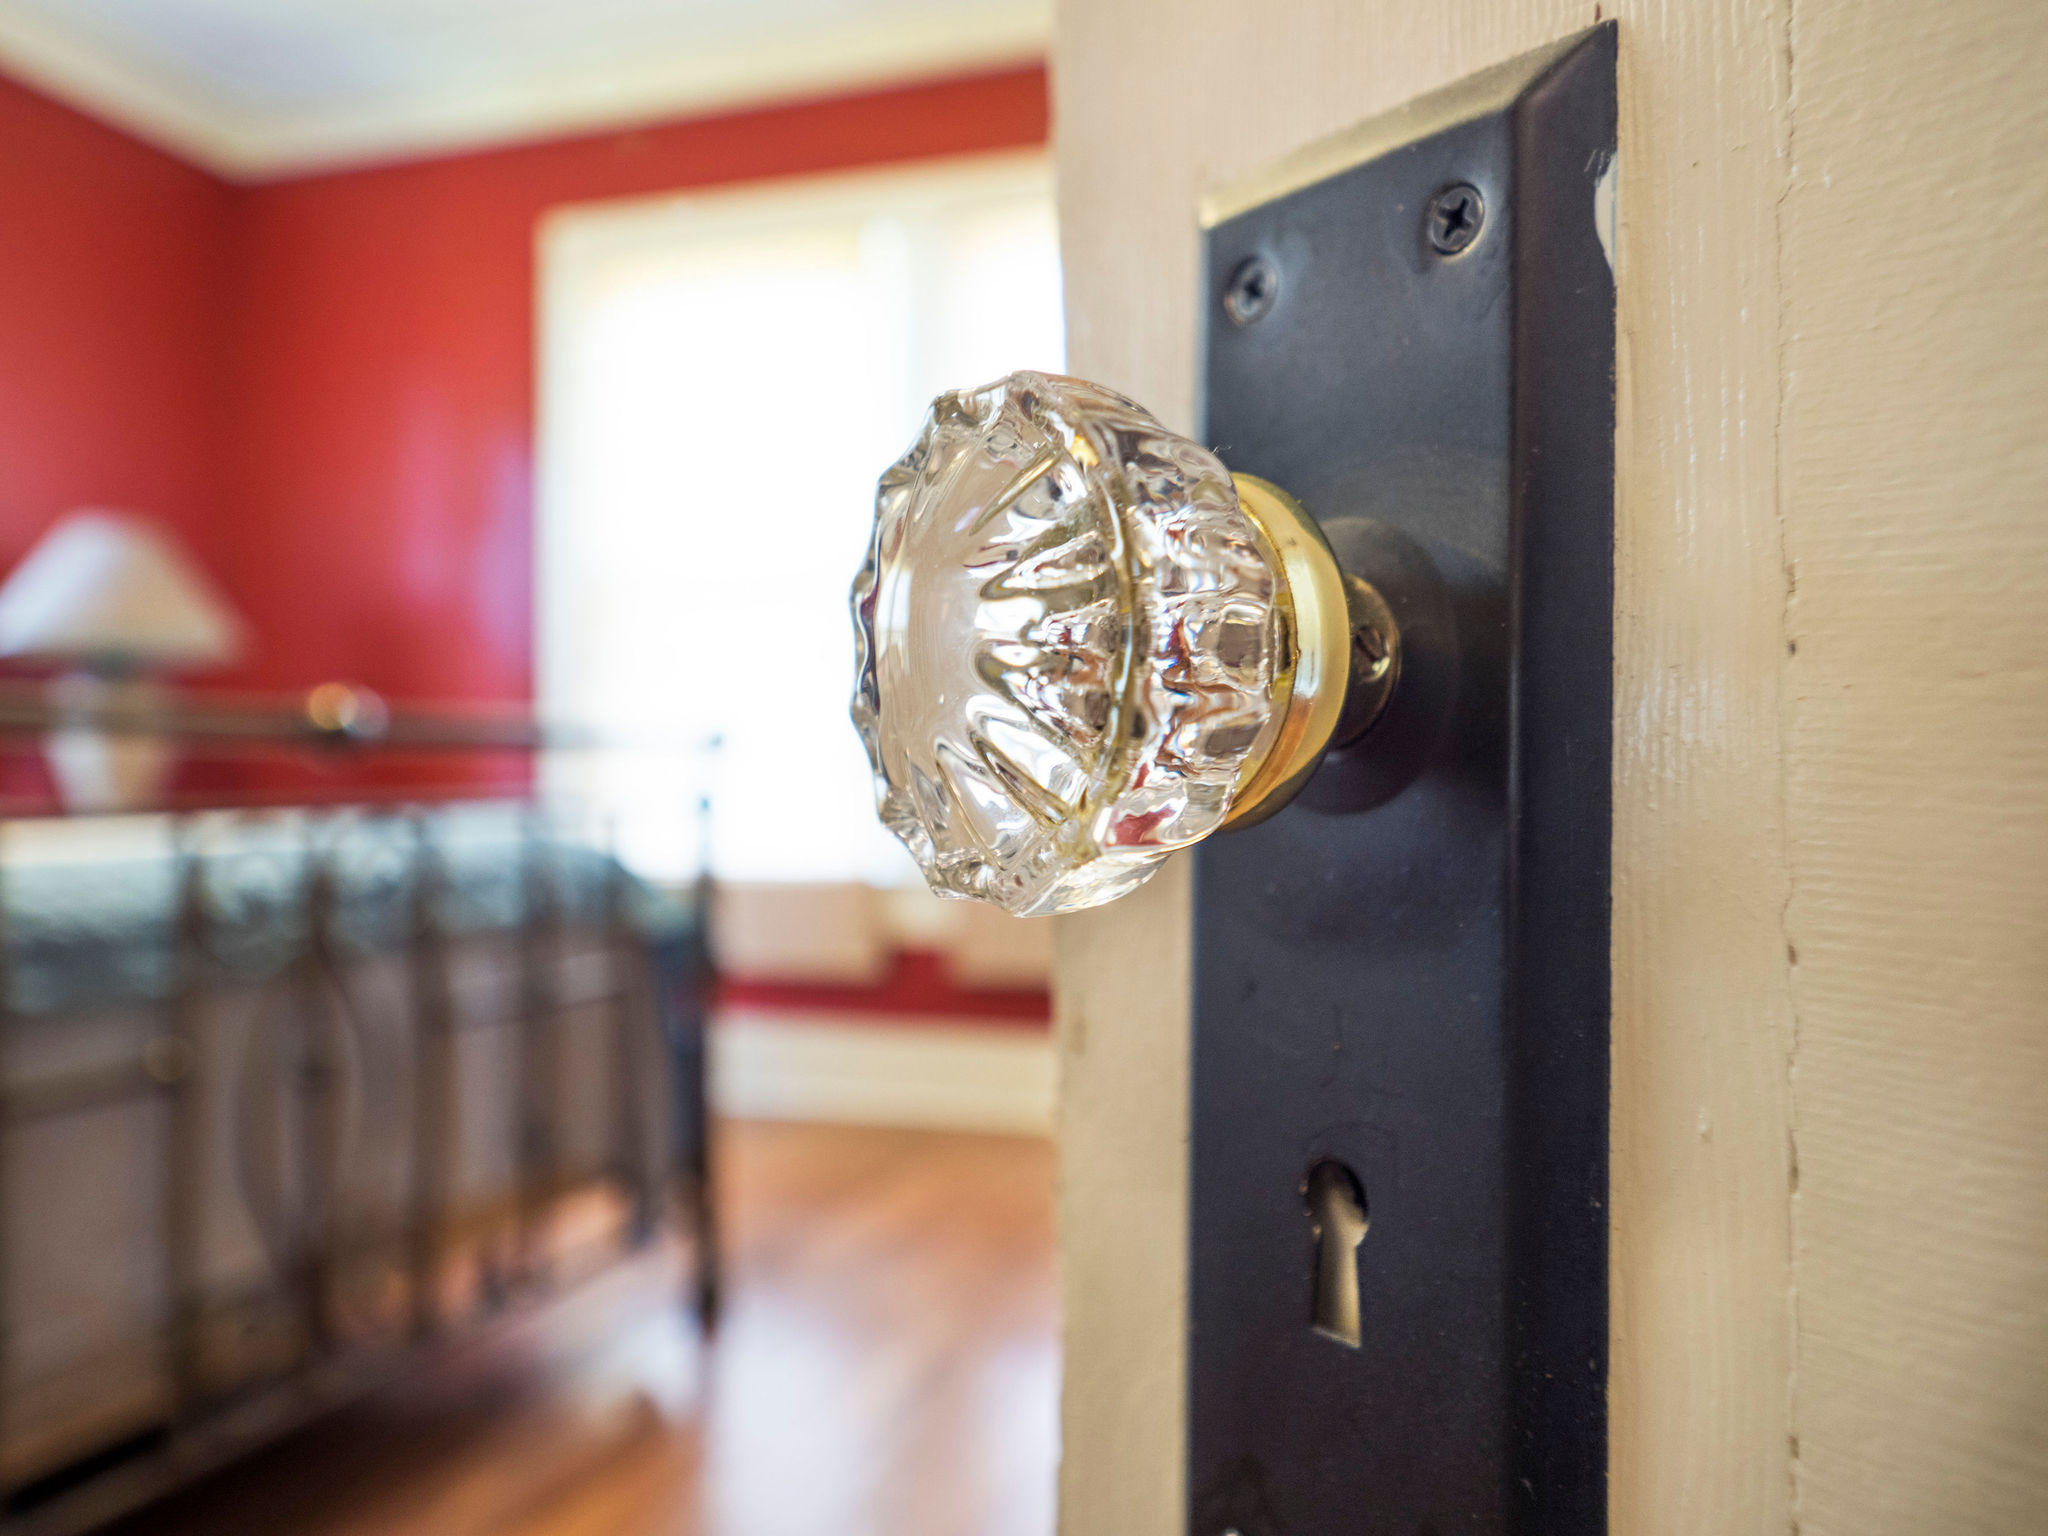 Oberlin home for sale, 206 N 4th St, Oberlin LA - $155,000